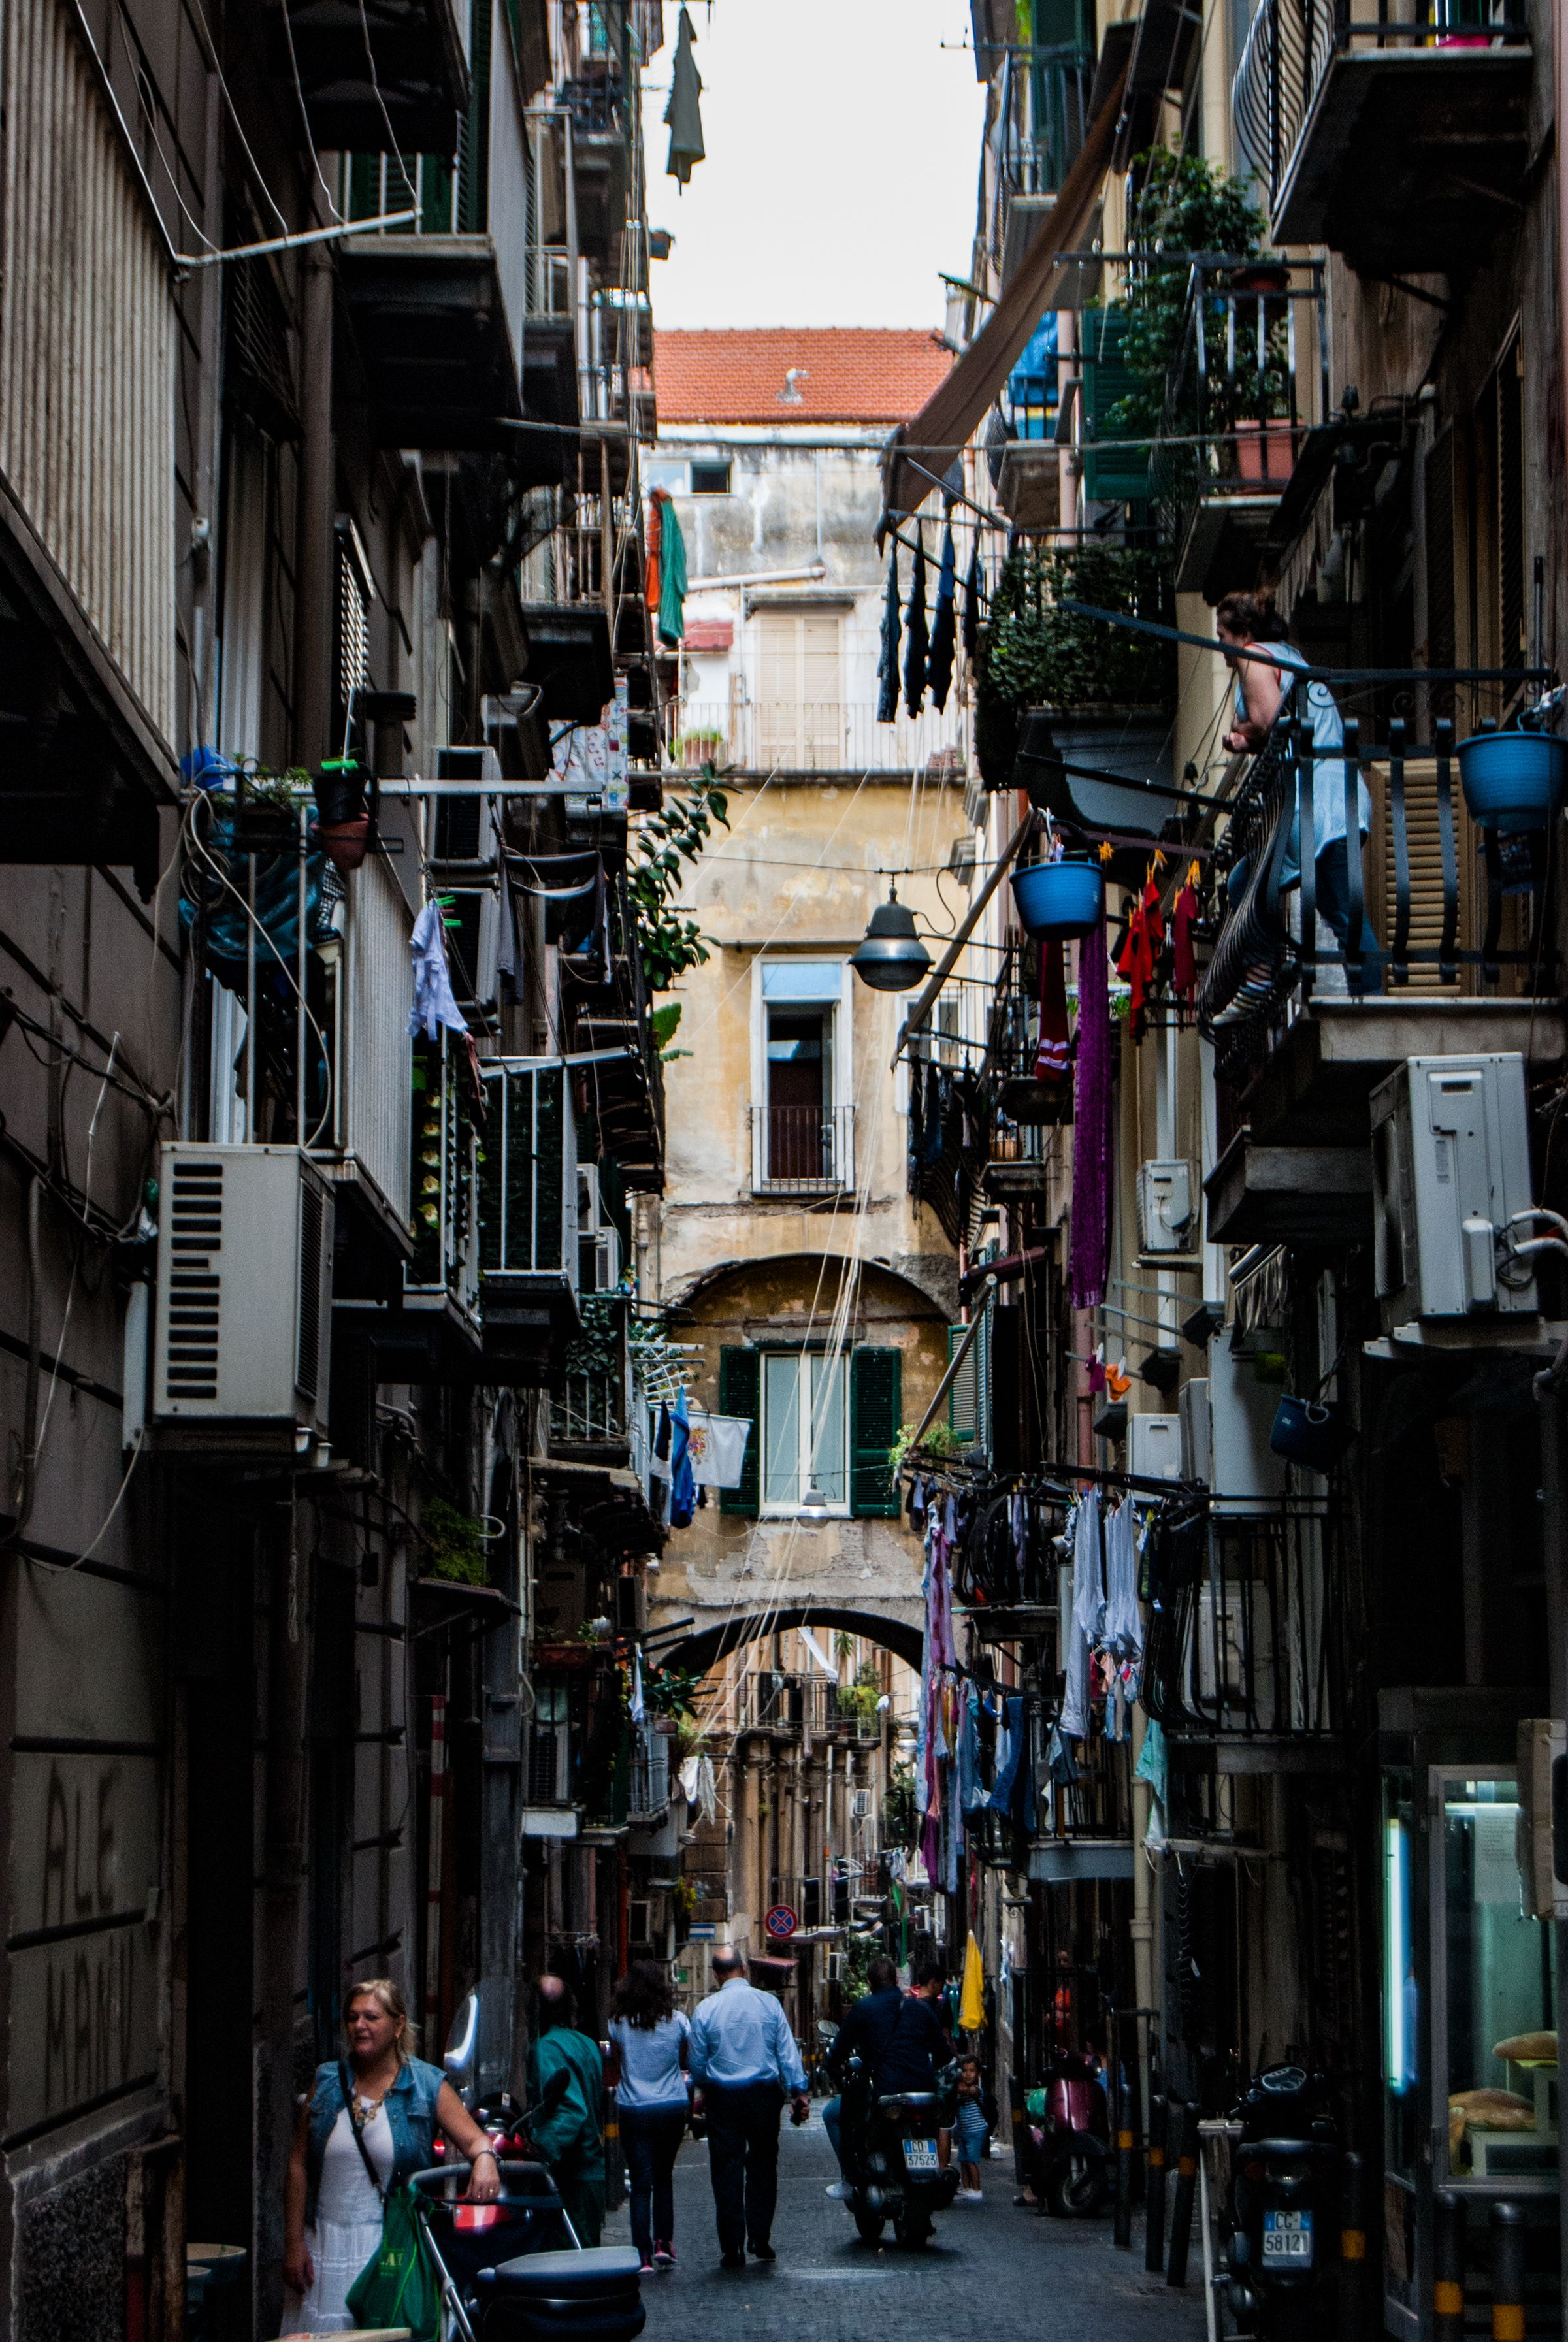 Appuntamento+a+Napoli